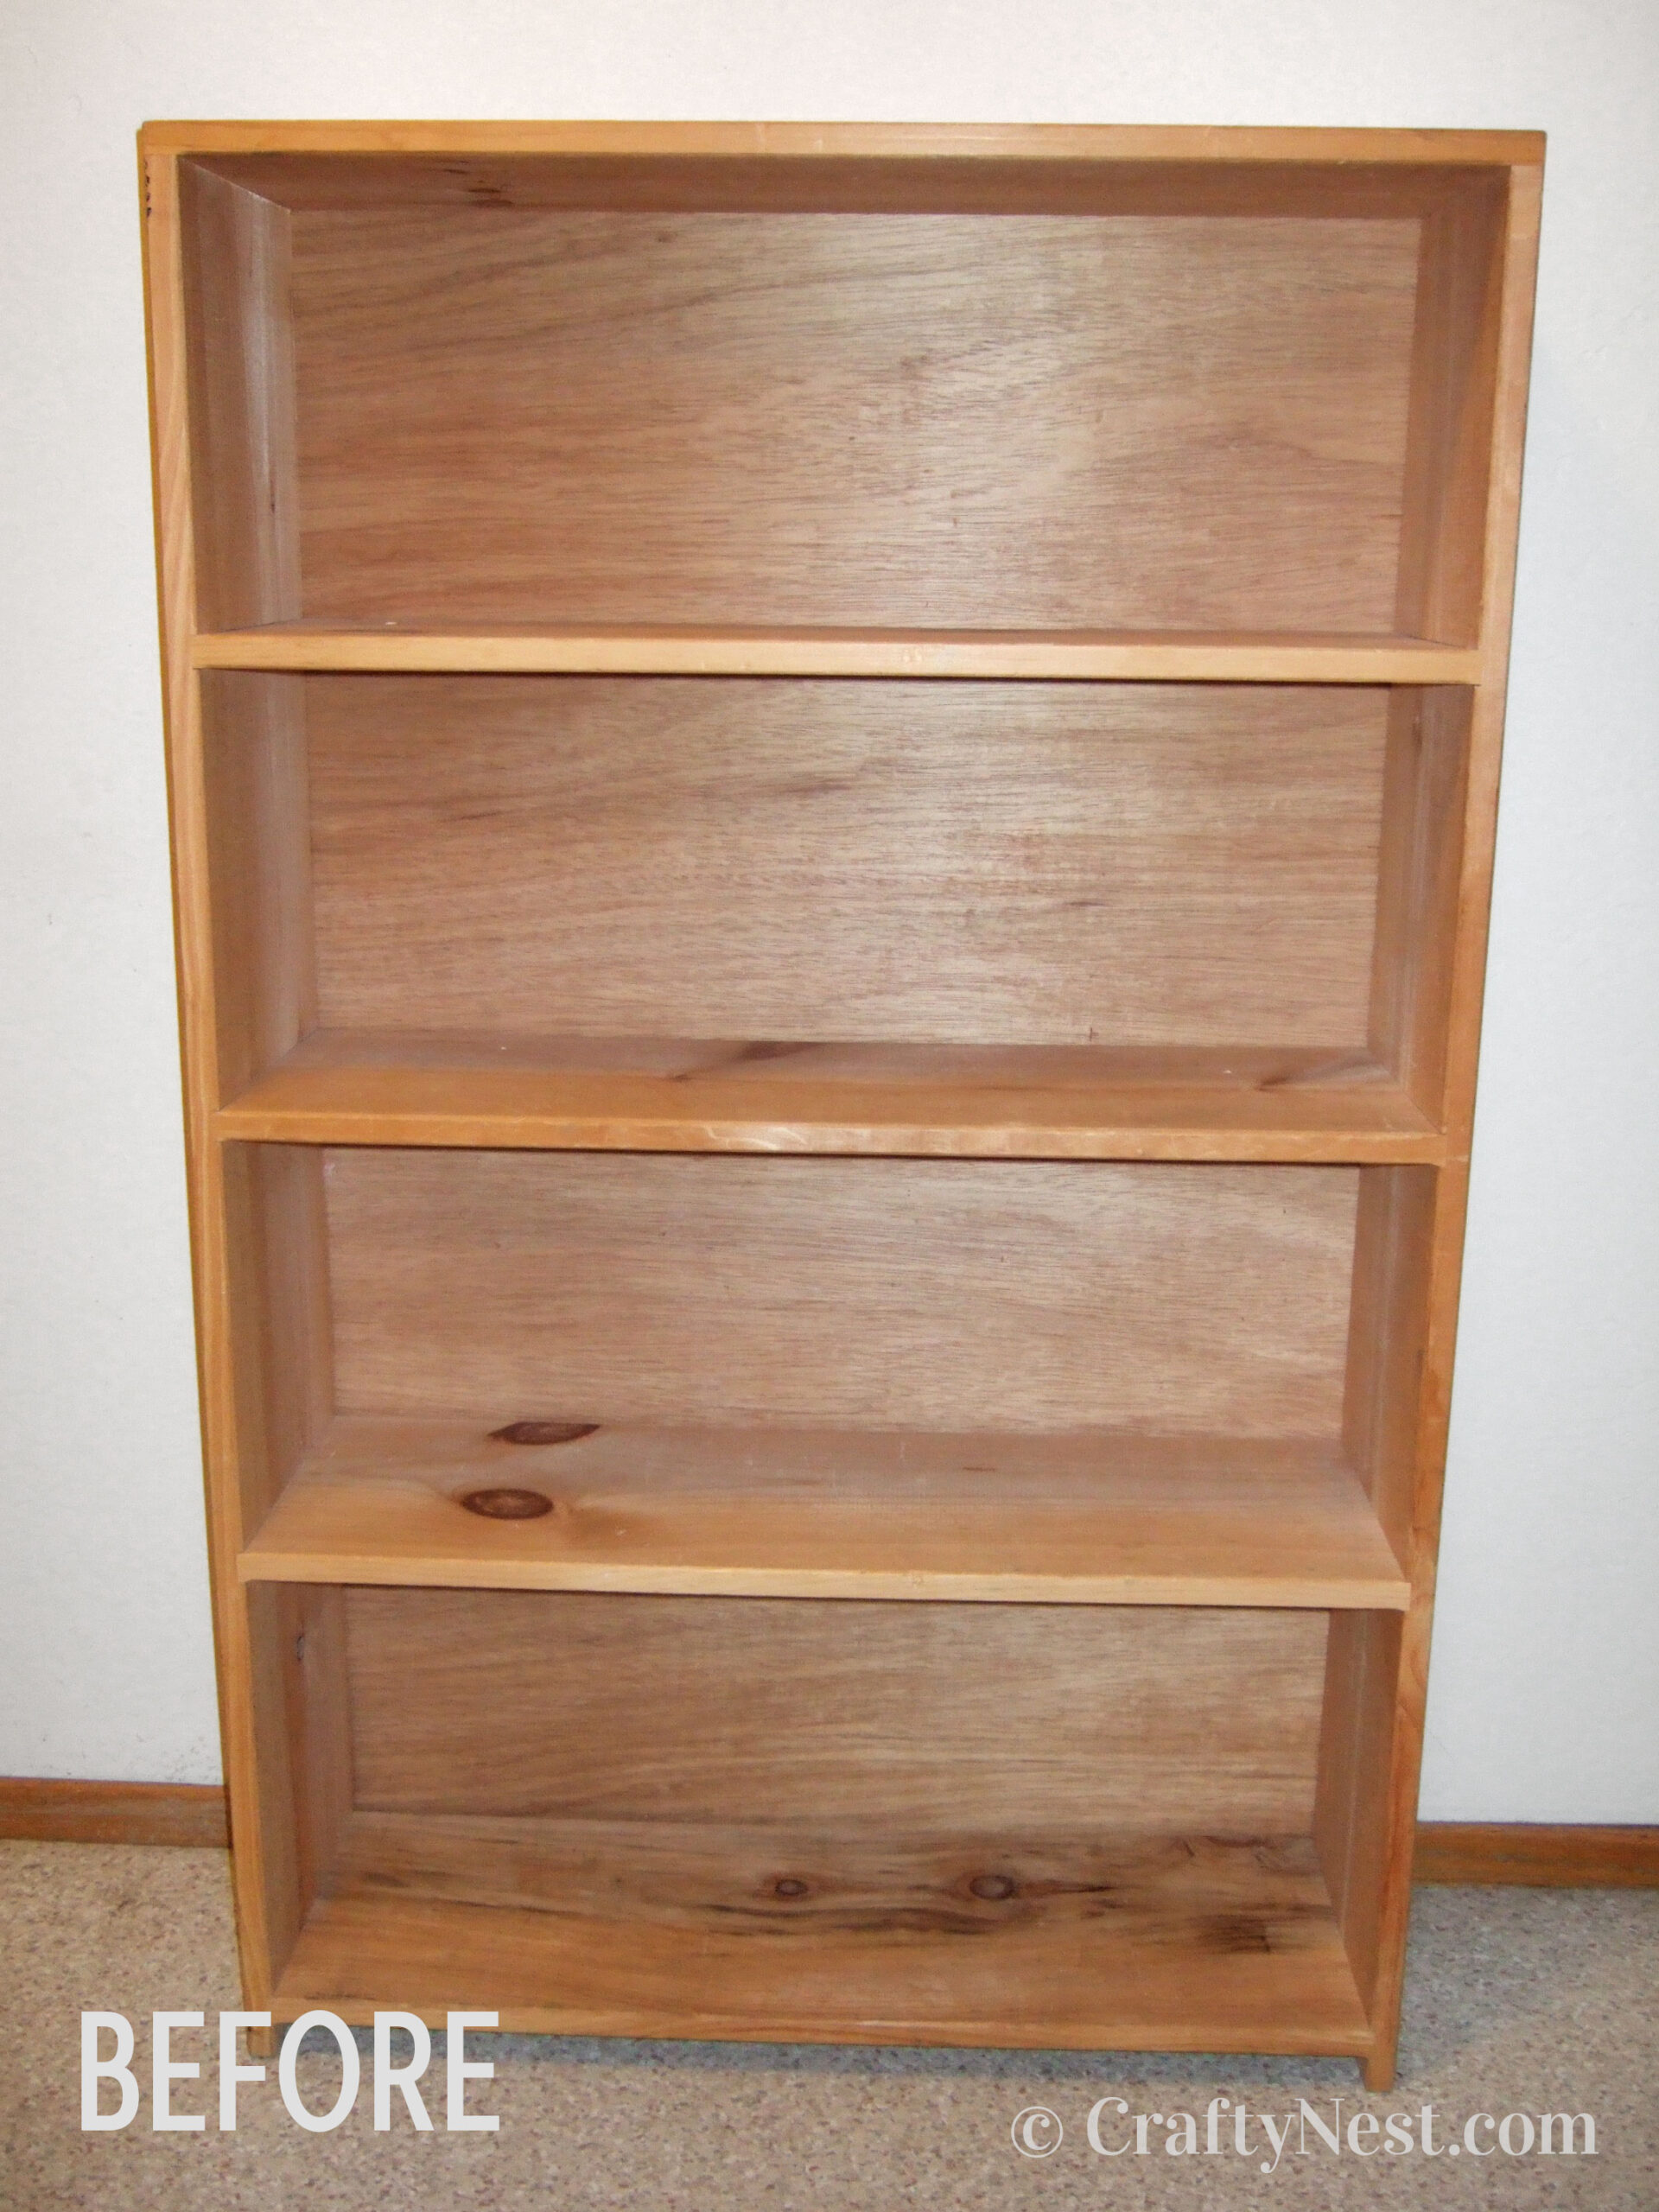 Plain bookshelf before the makeover, photo